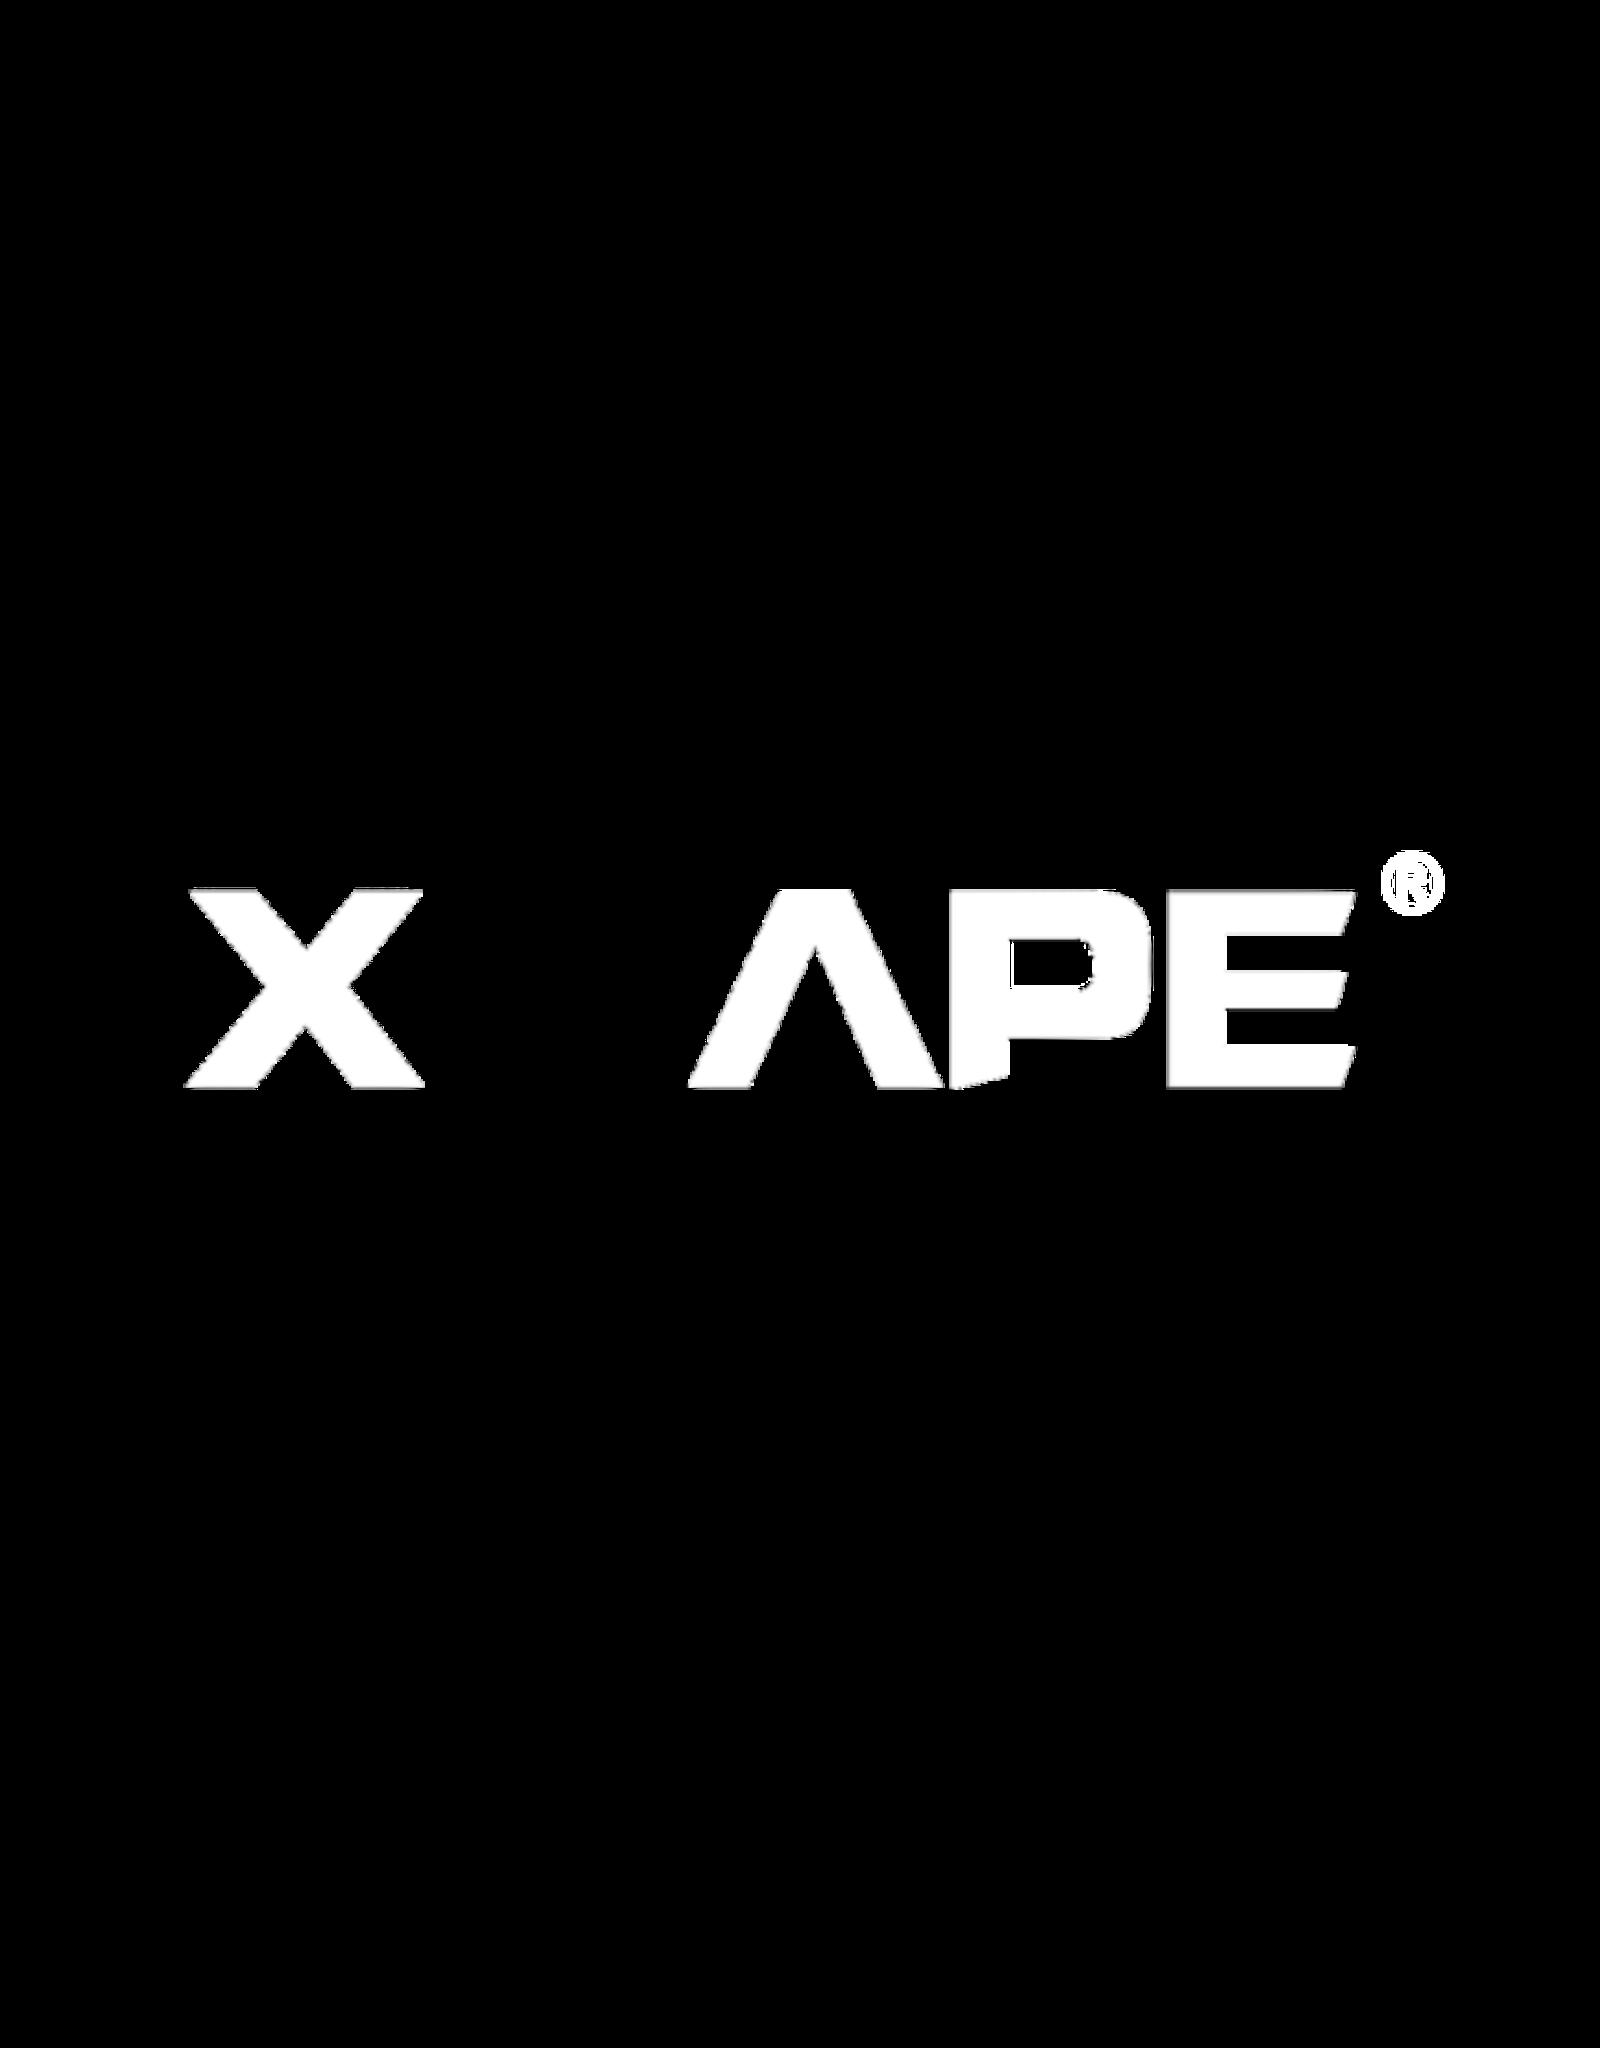 XMAX XMAX Xvape V-One 2.0 Coils